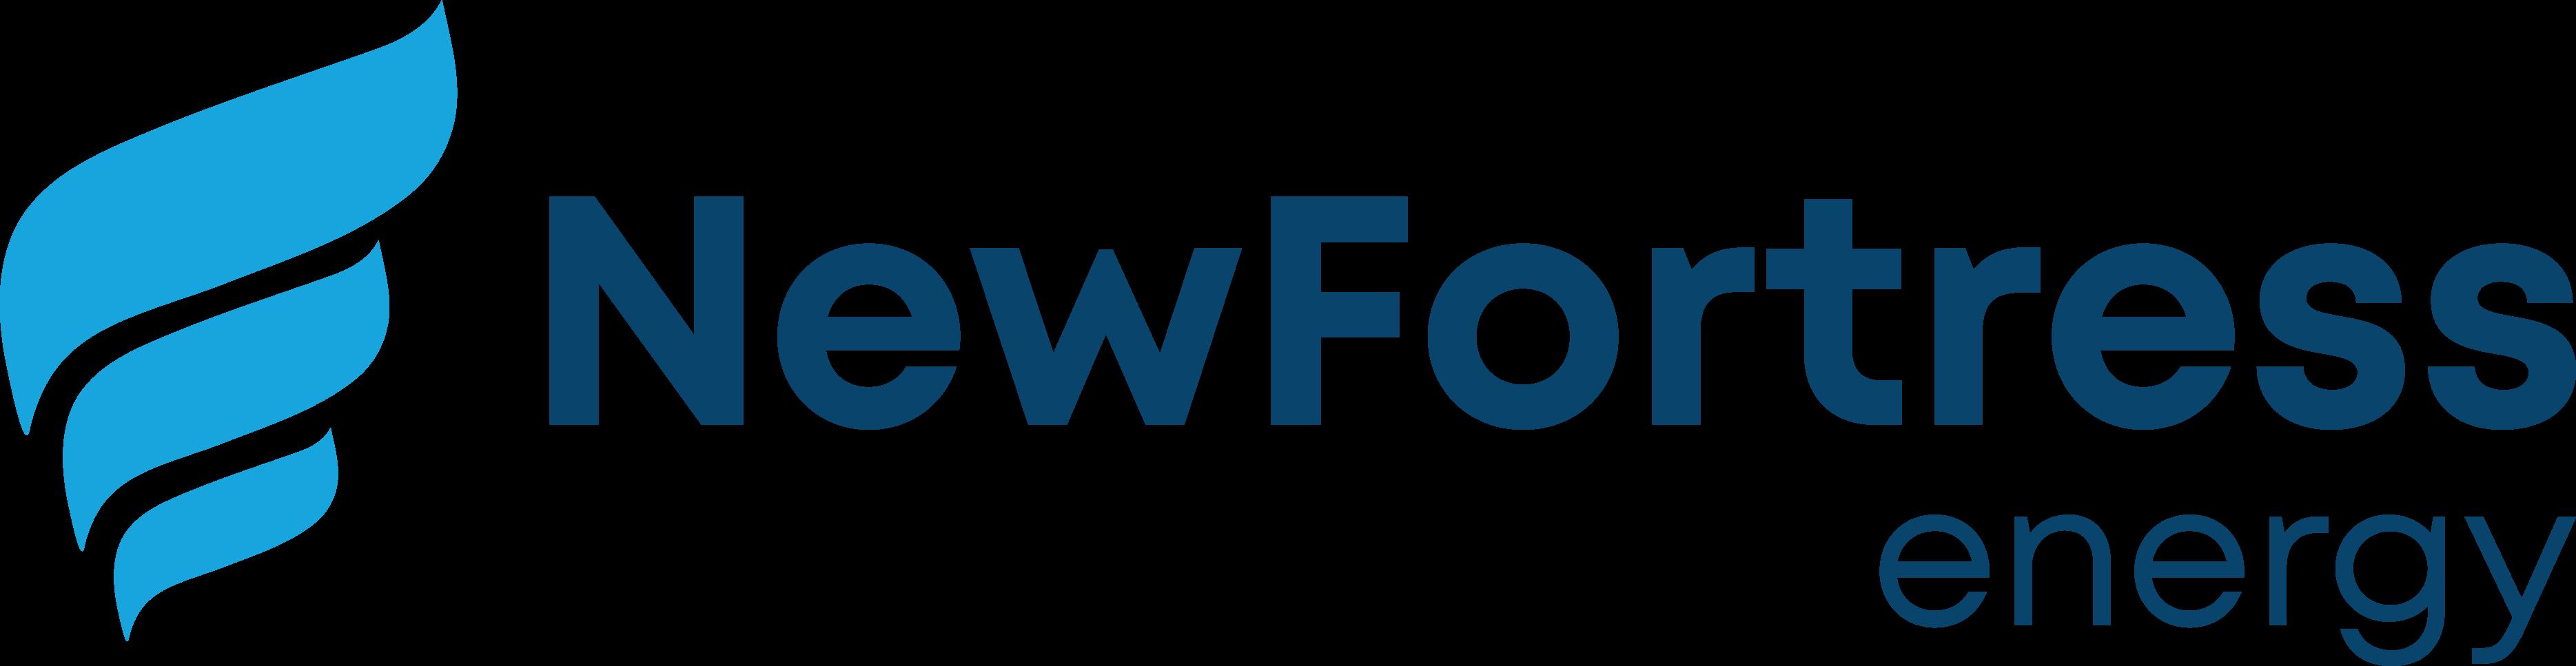 Logotipo do/da New Fortress Energy